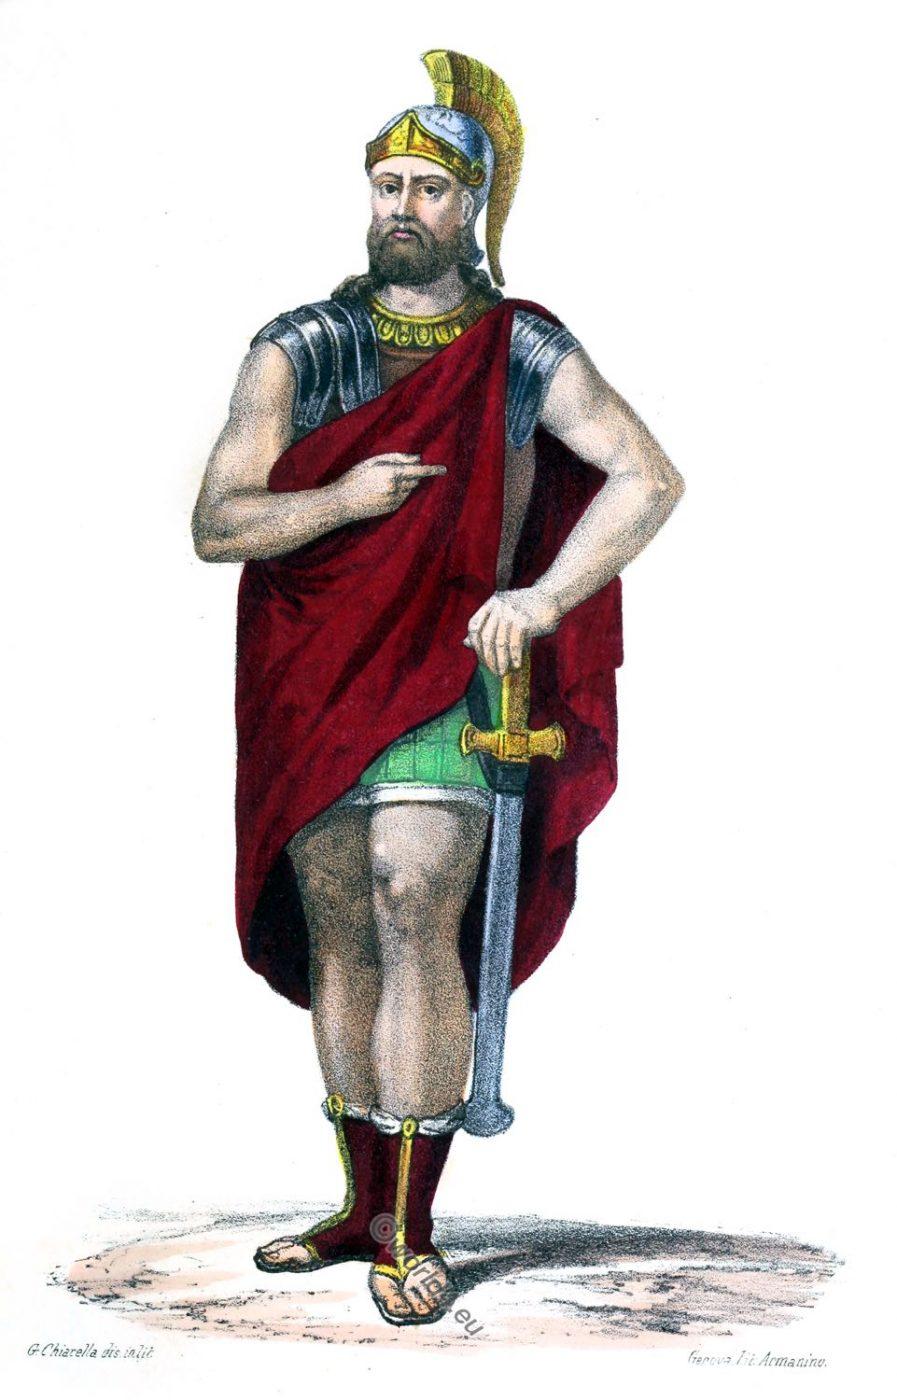 Jugurtha, Jugurthen, Giugurta, Rome, Numidia, ancient, Roman history, Berber leader,